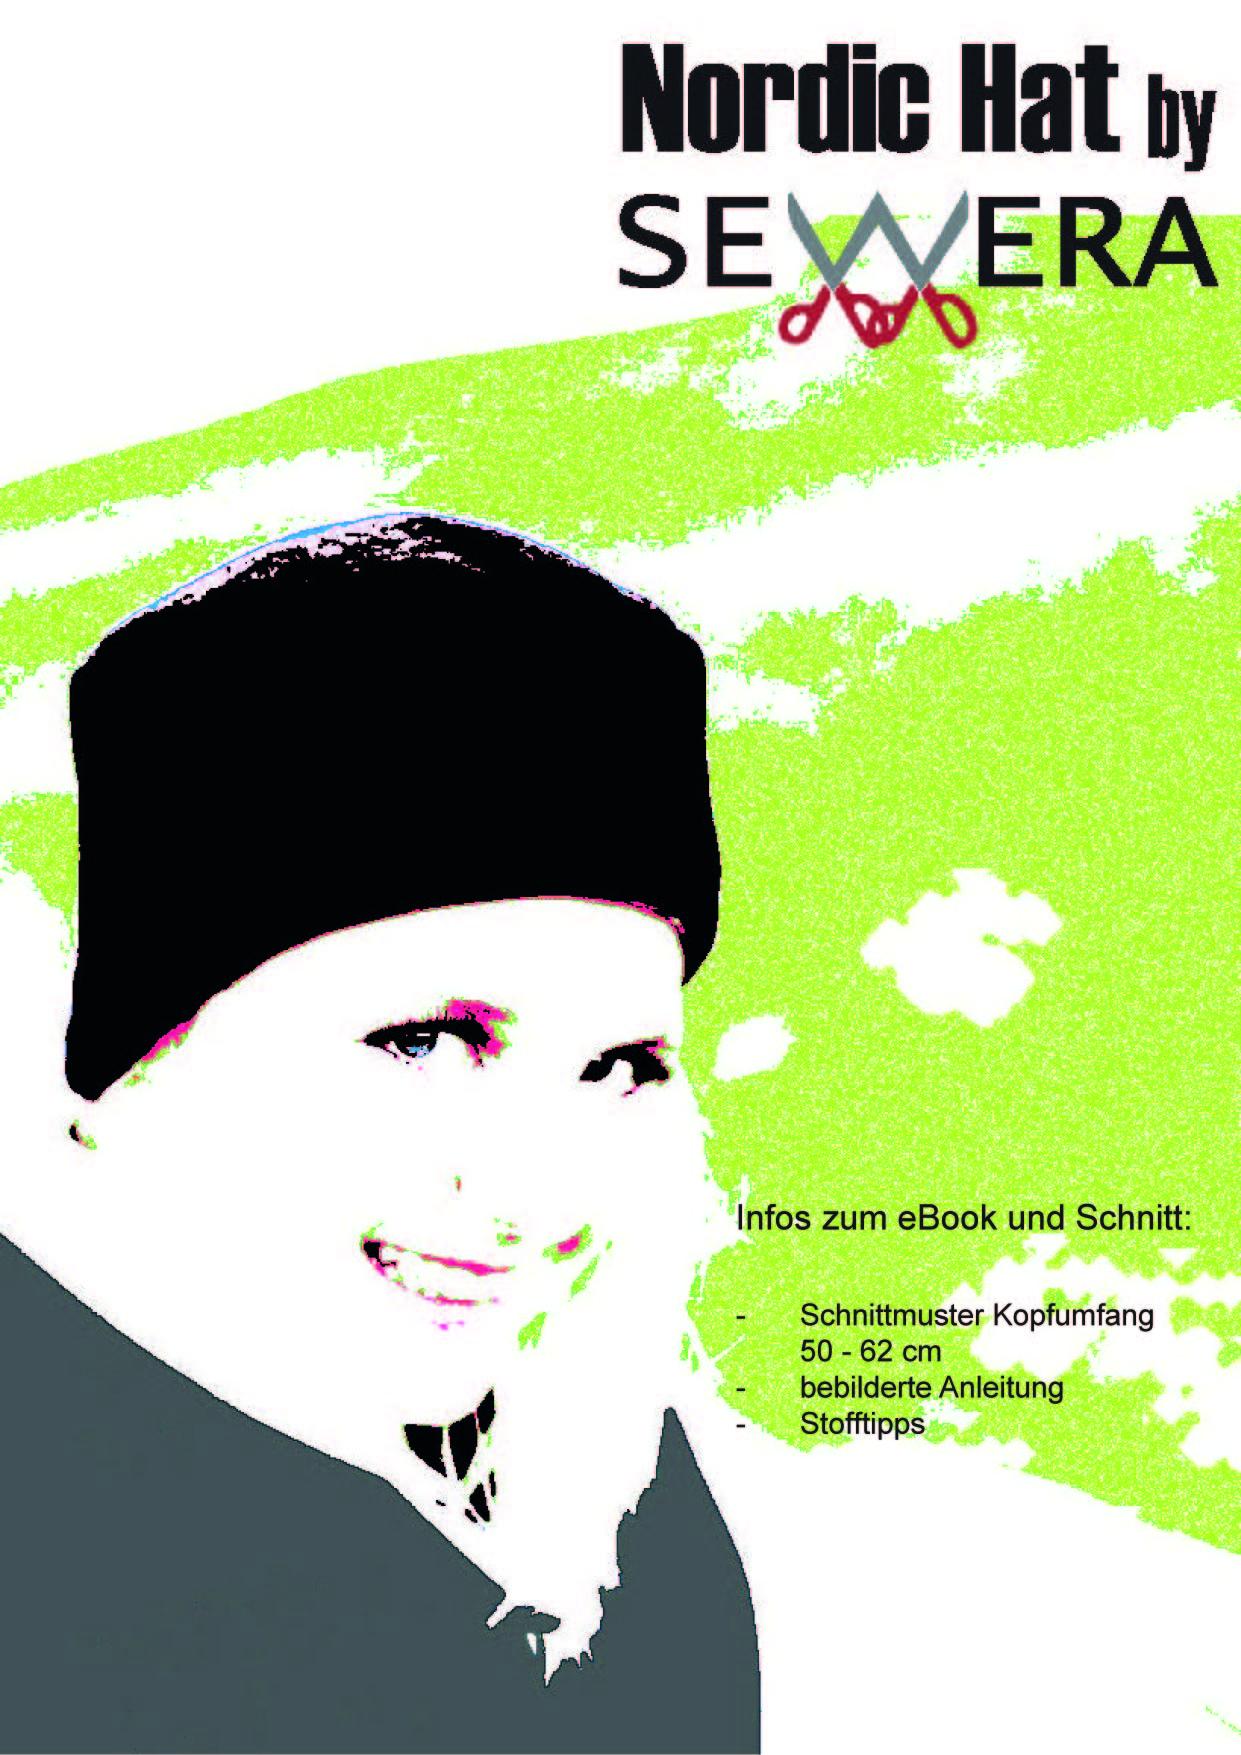 Nordic Hat Schnittmuster & Anleitung by Sewera - Sewera Fashion